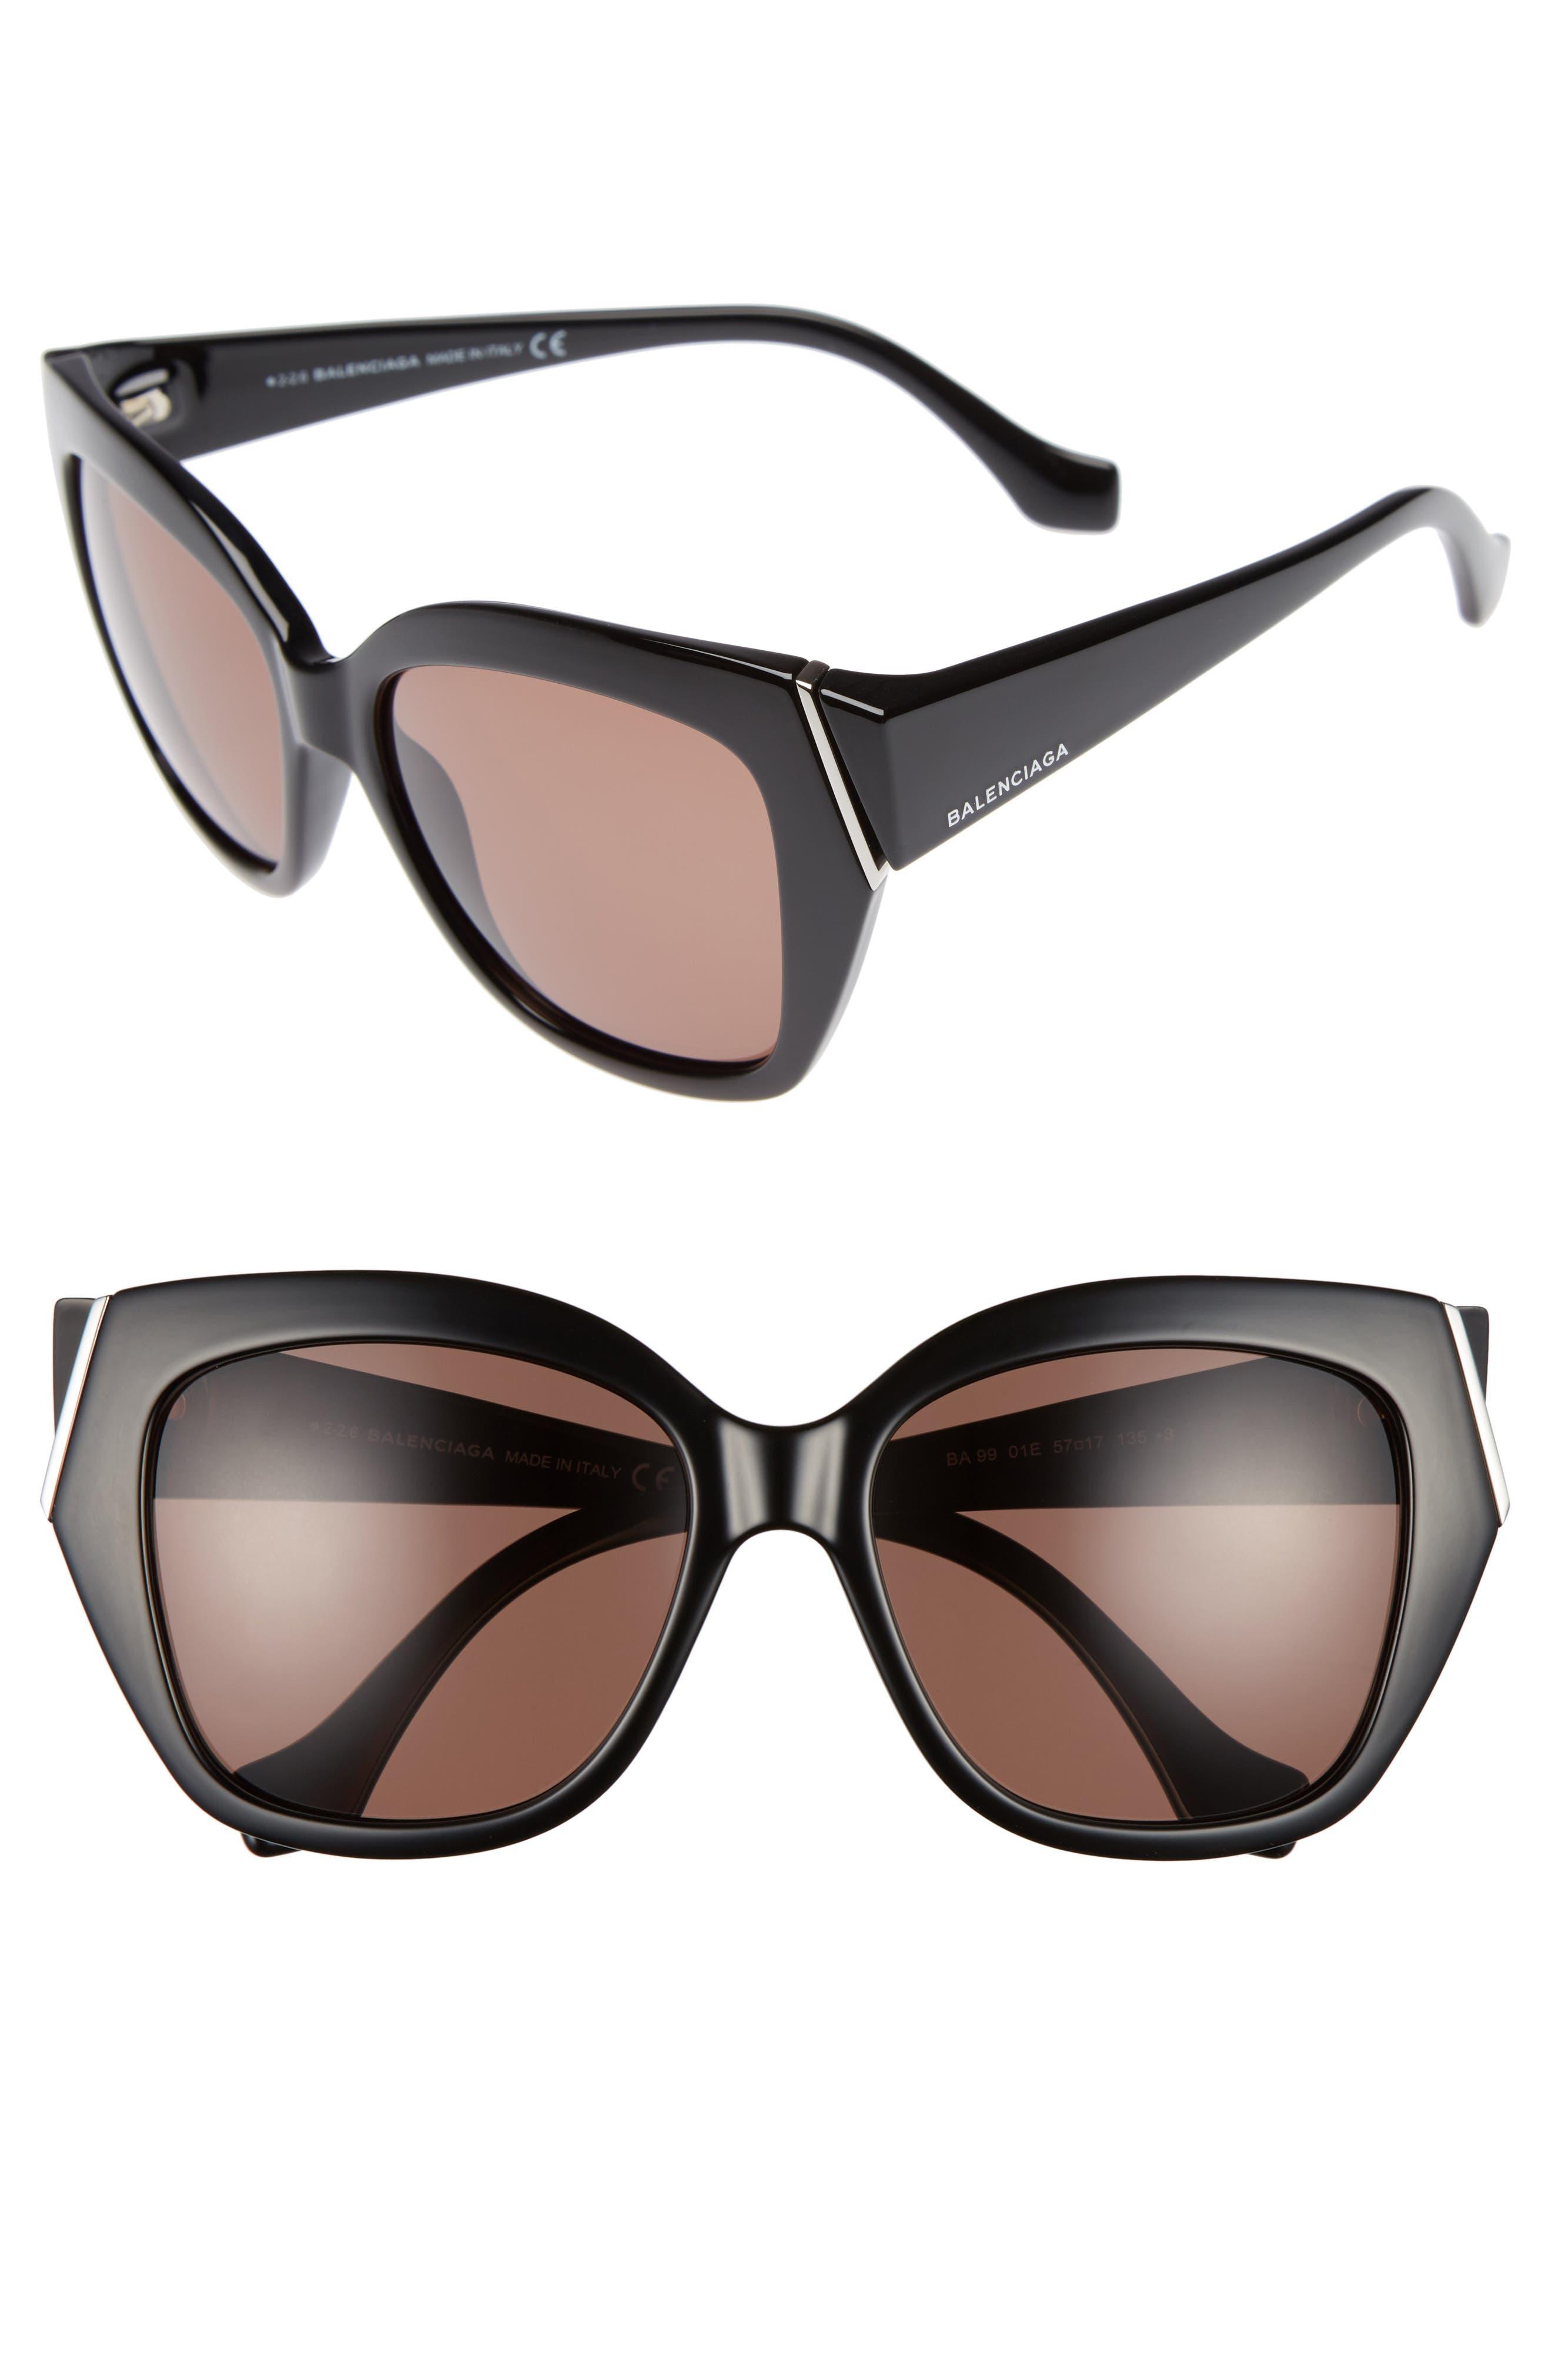 82d503e4a2f75 Sunglasses Balenciaga